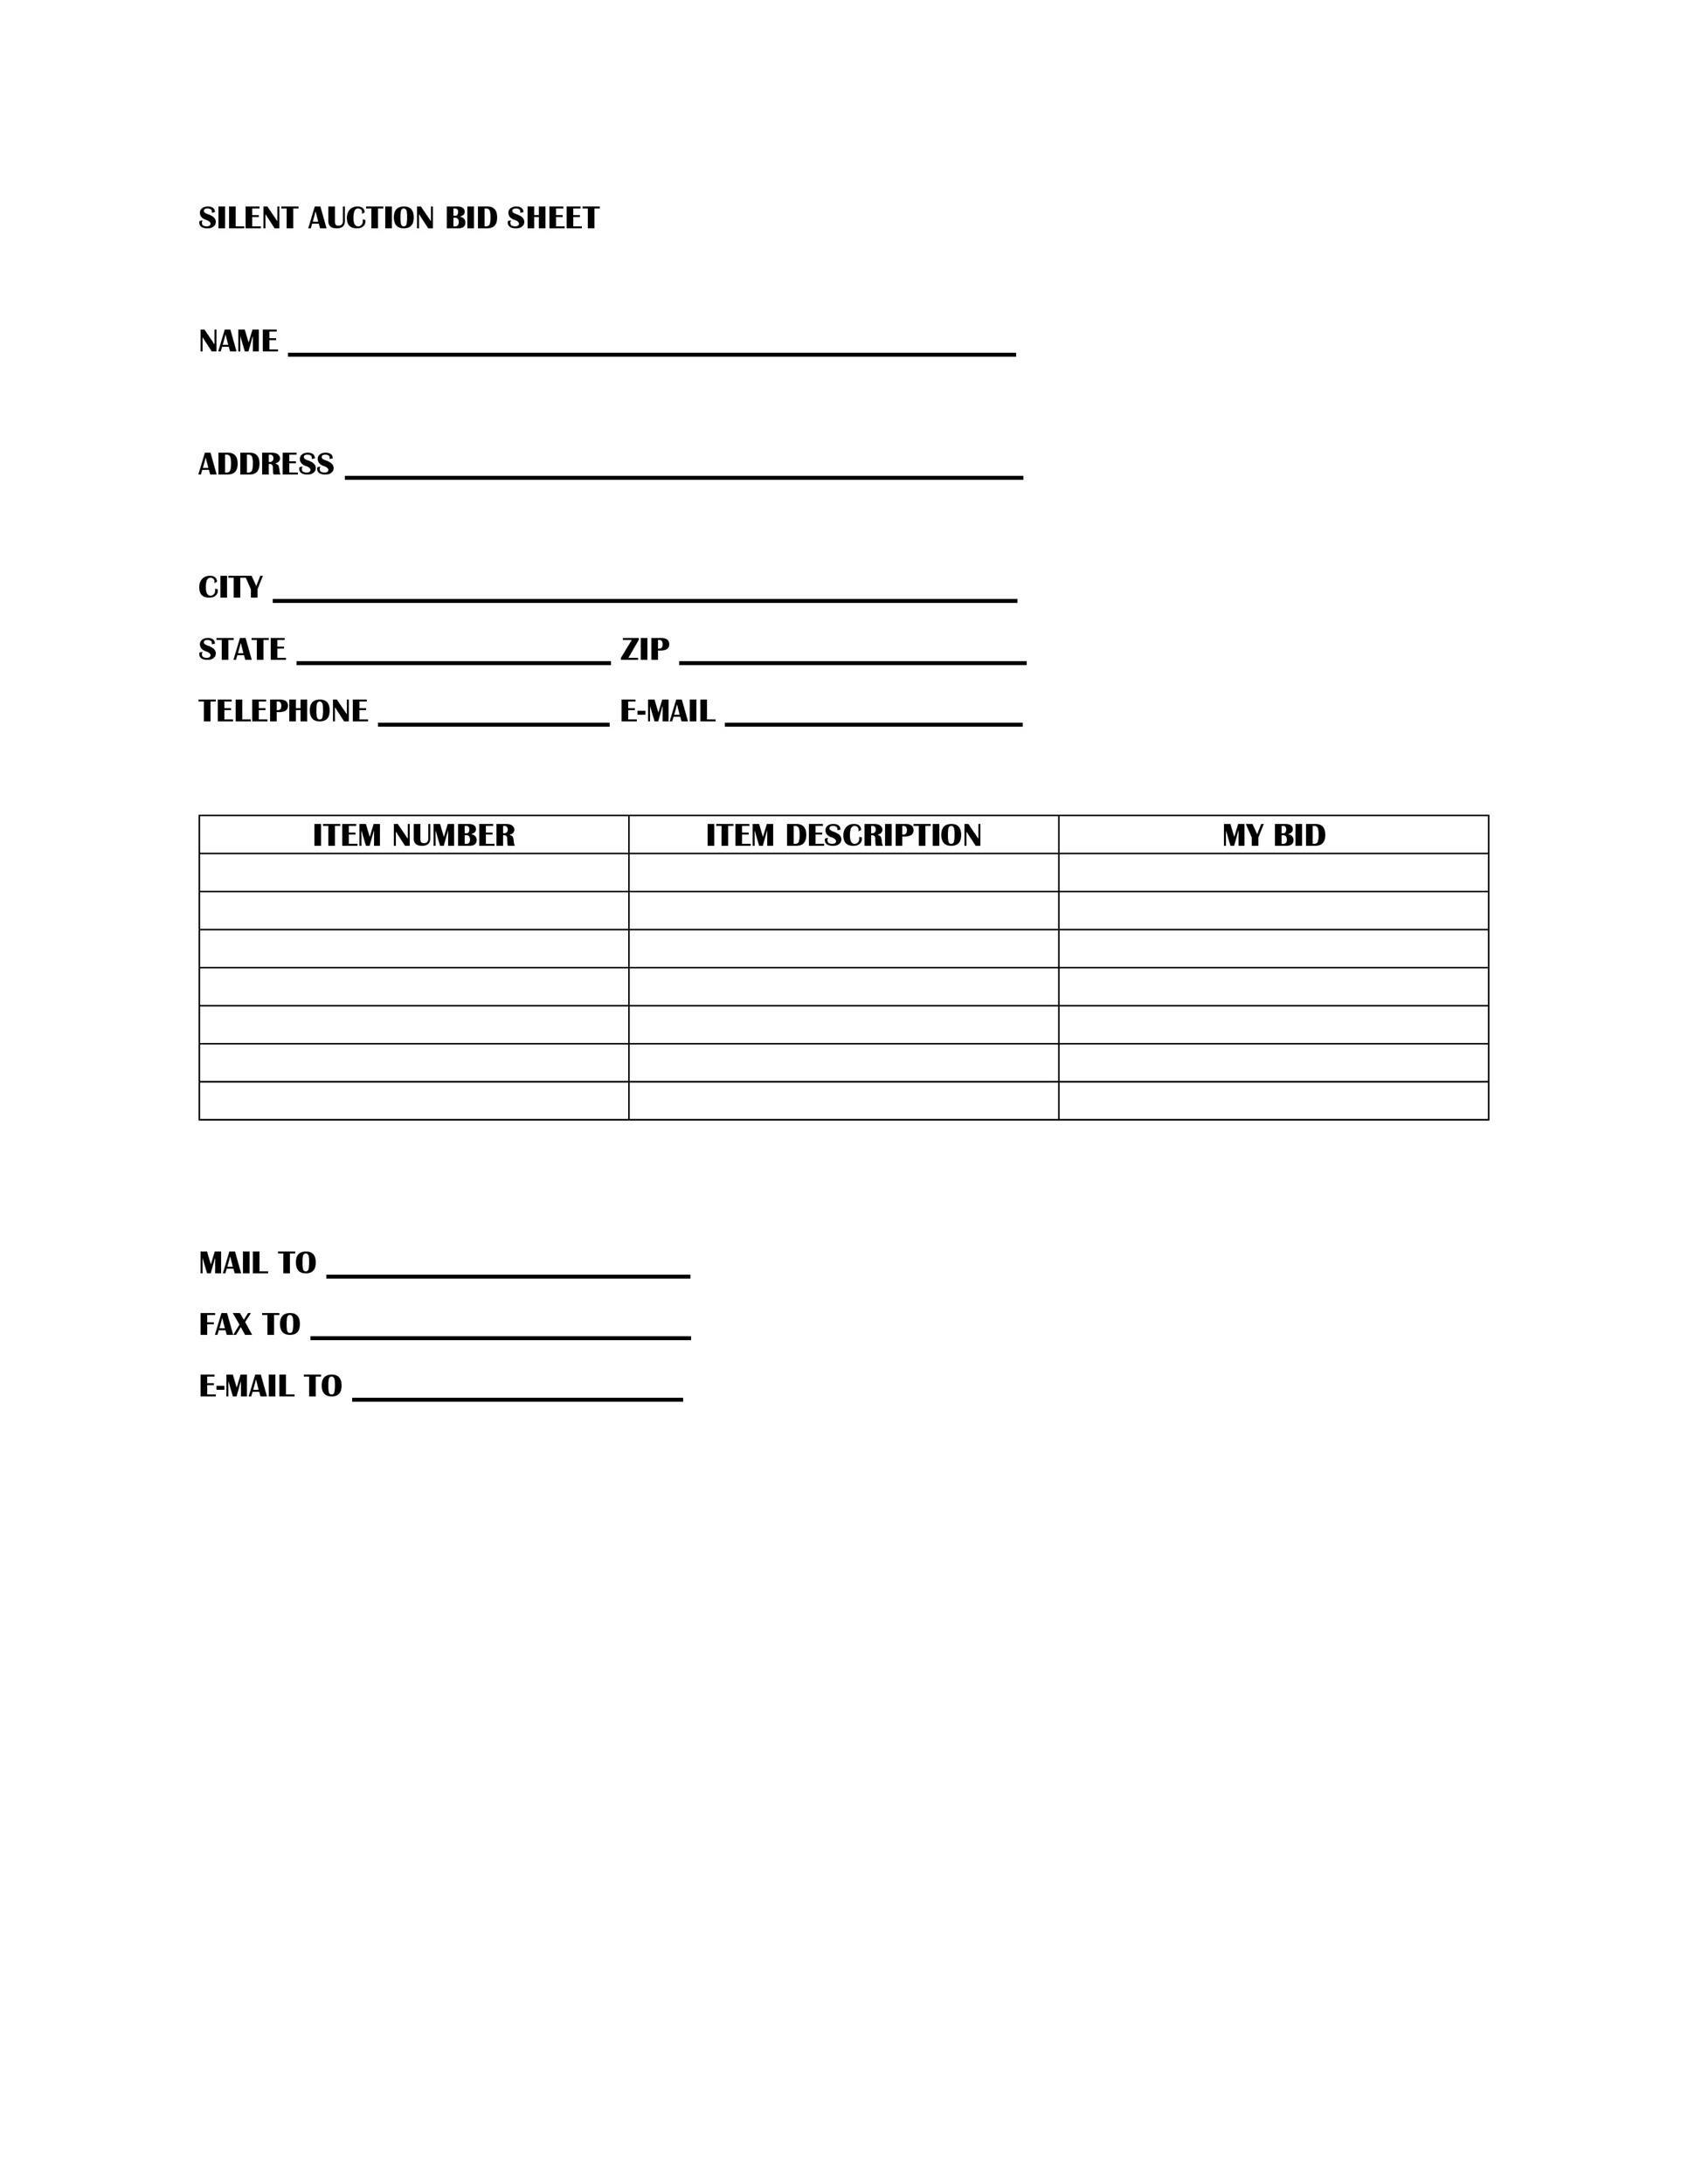 Free Silent Auction Bid Sheet 17